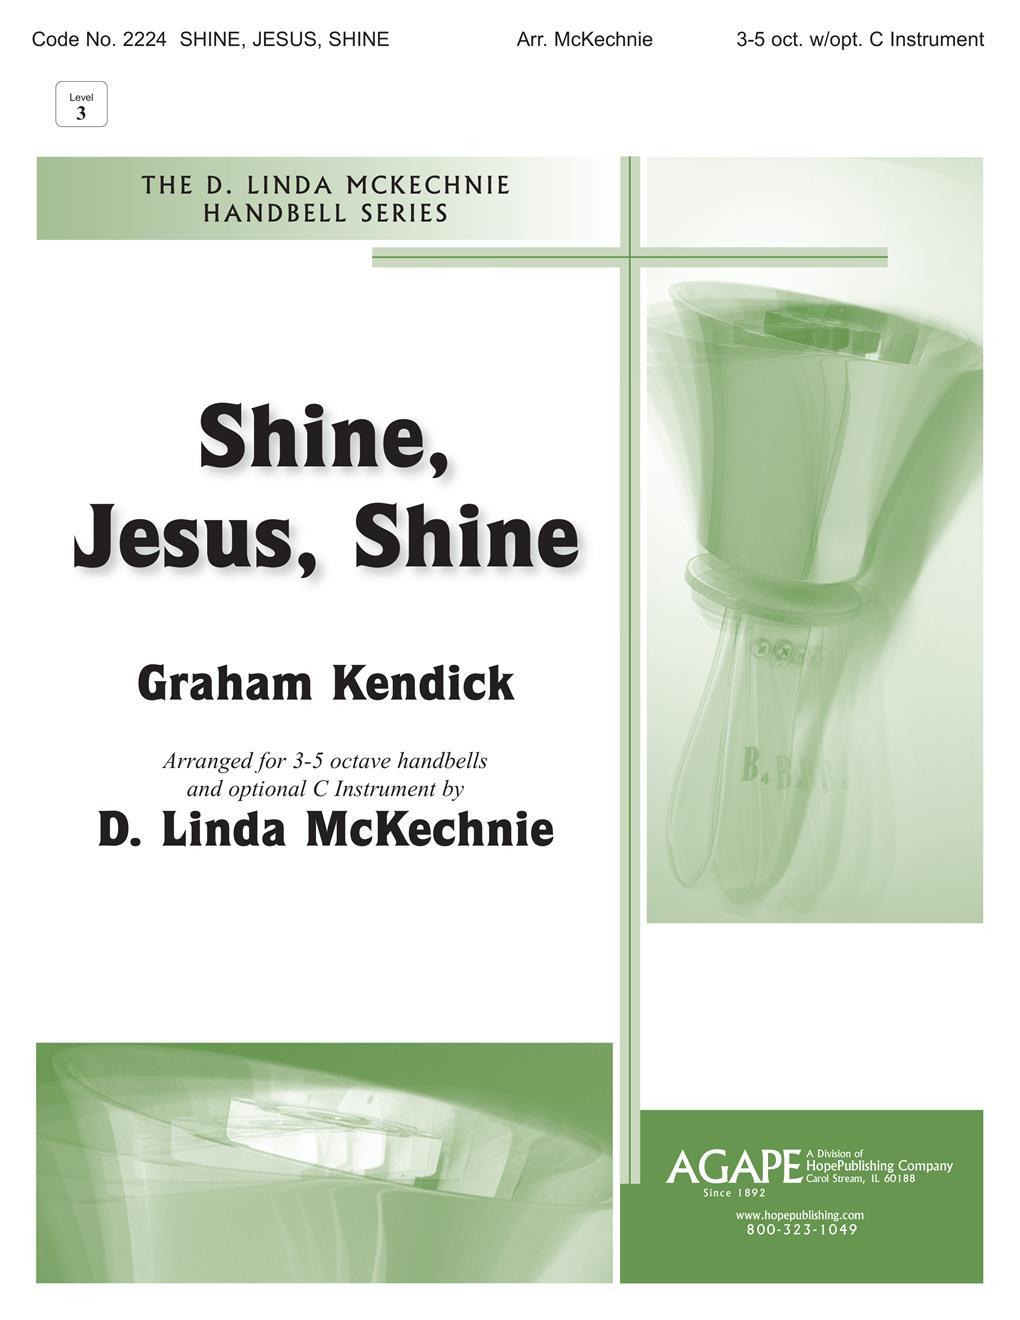 Shine Jesus Shine - 3-5 Octave Cover Image